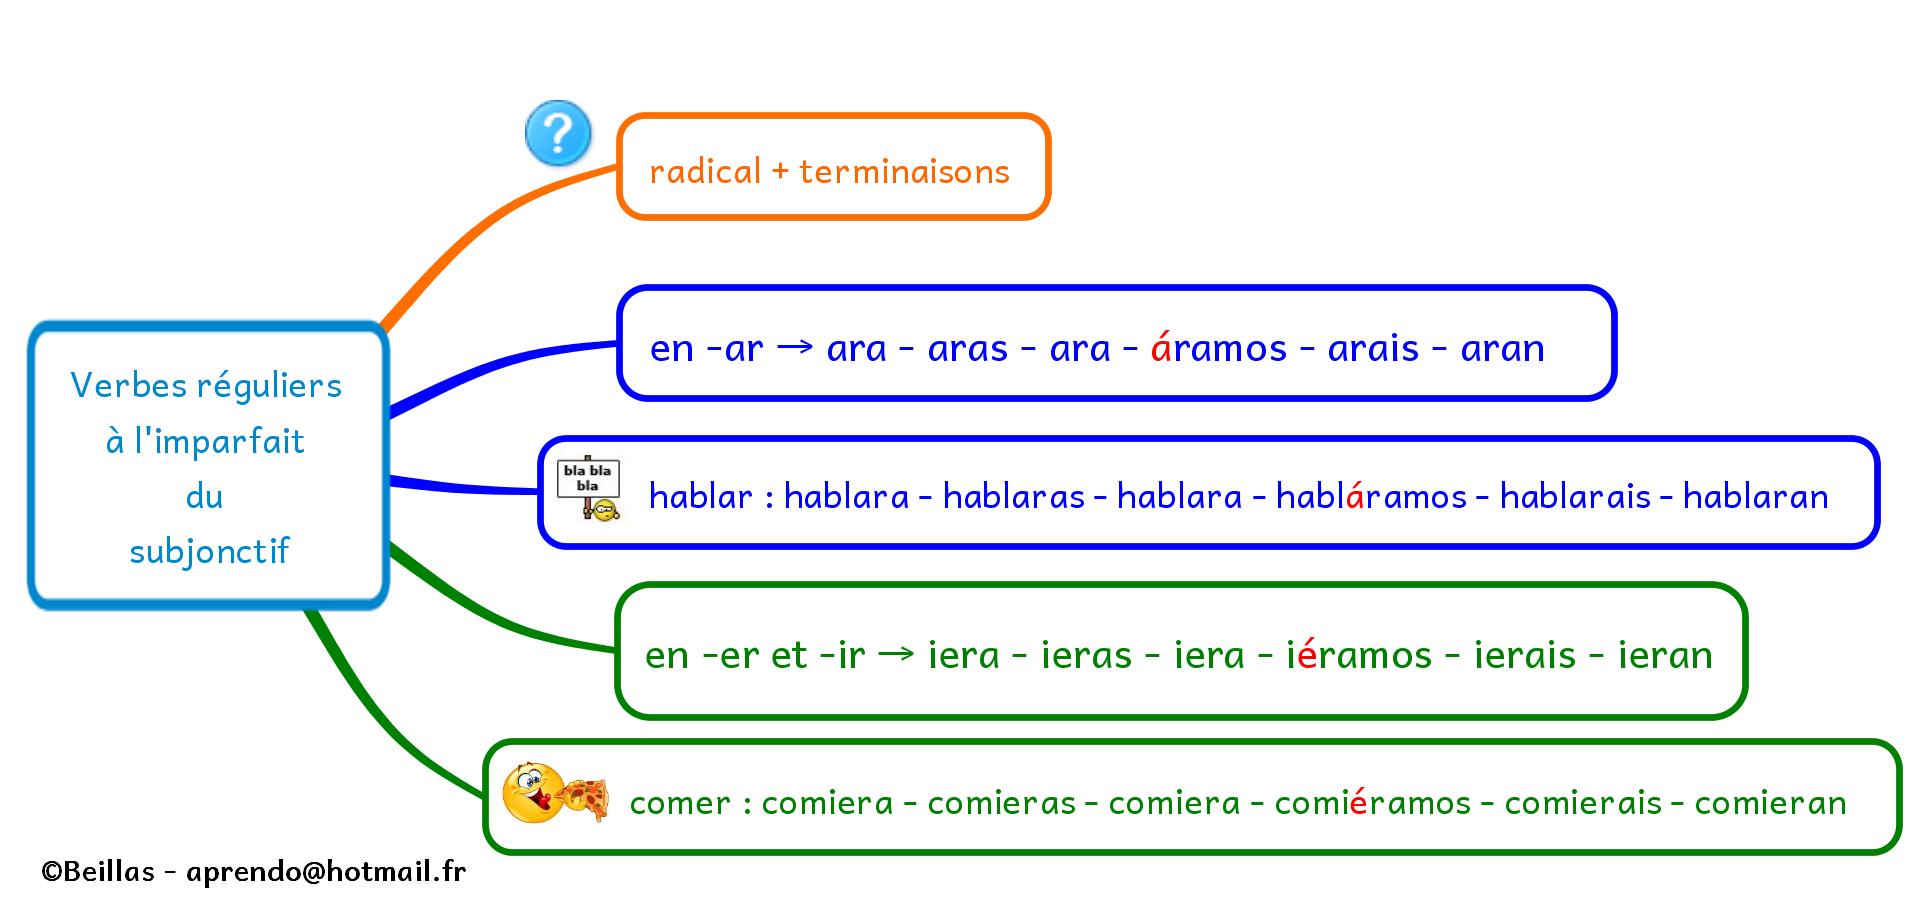 Subjonctif Imparfait Verbes Reguliers Verbe Espagnol Imparfait